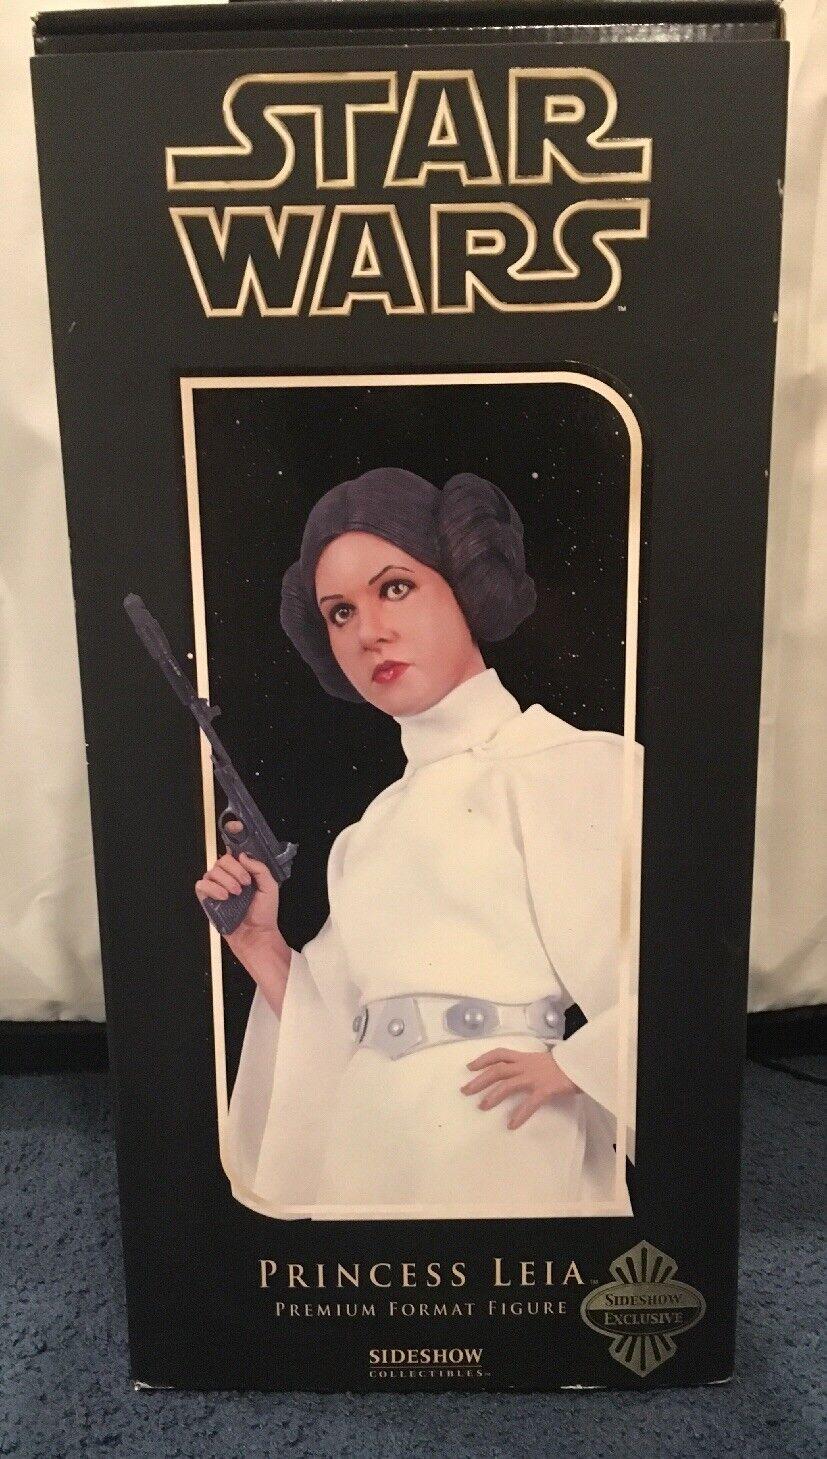 NIB Limited  0680RARE SIDESHOW Star Wars Princess Leia Premium Figure 1:4Statue